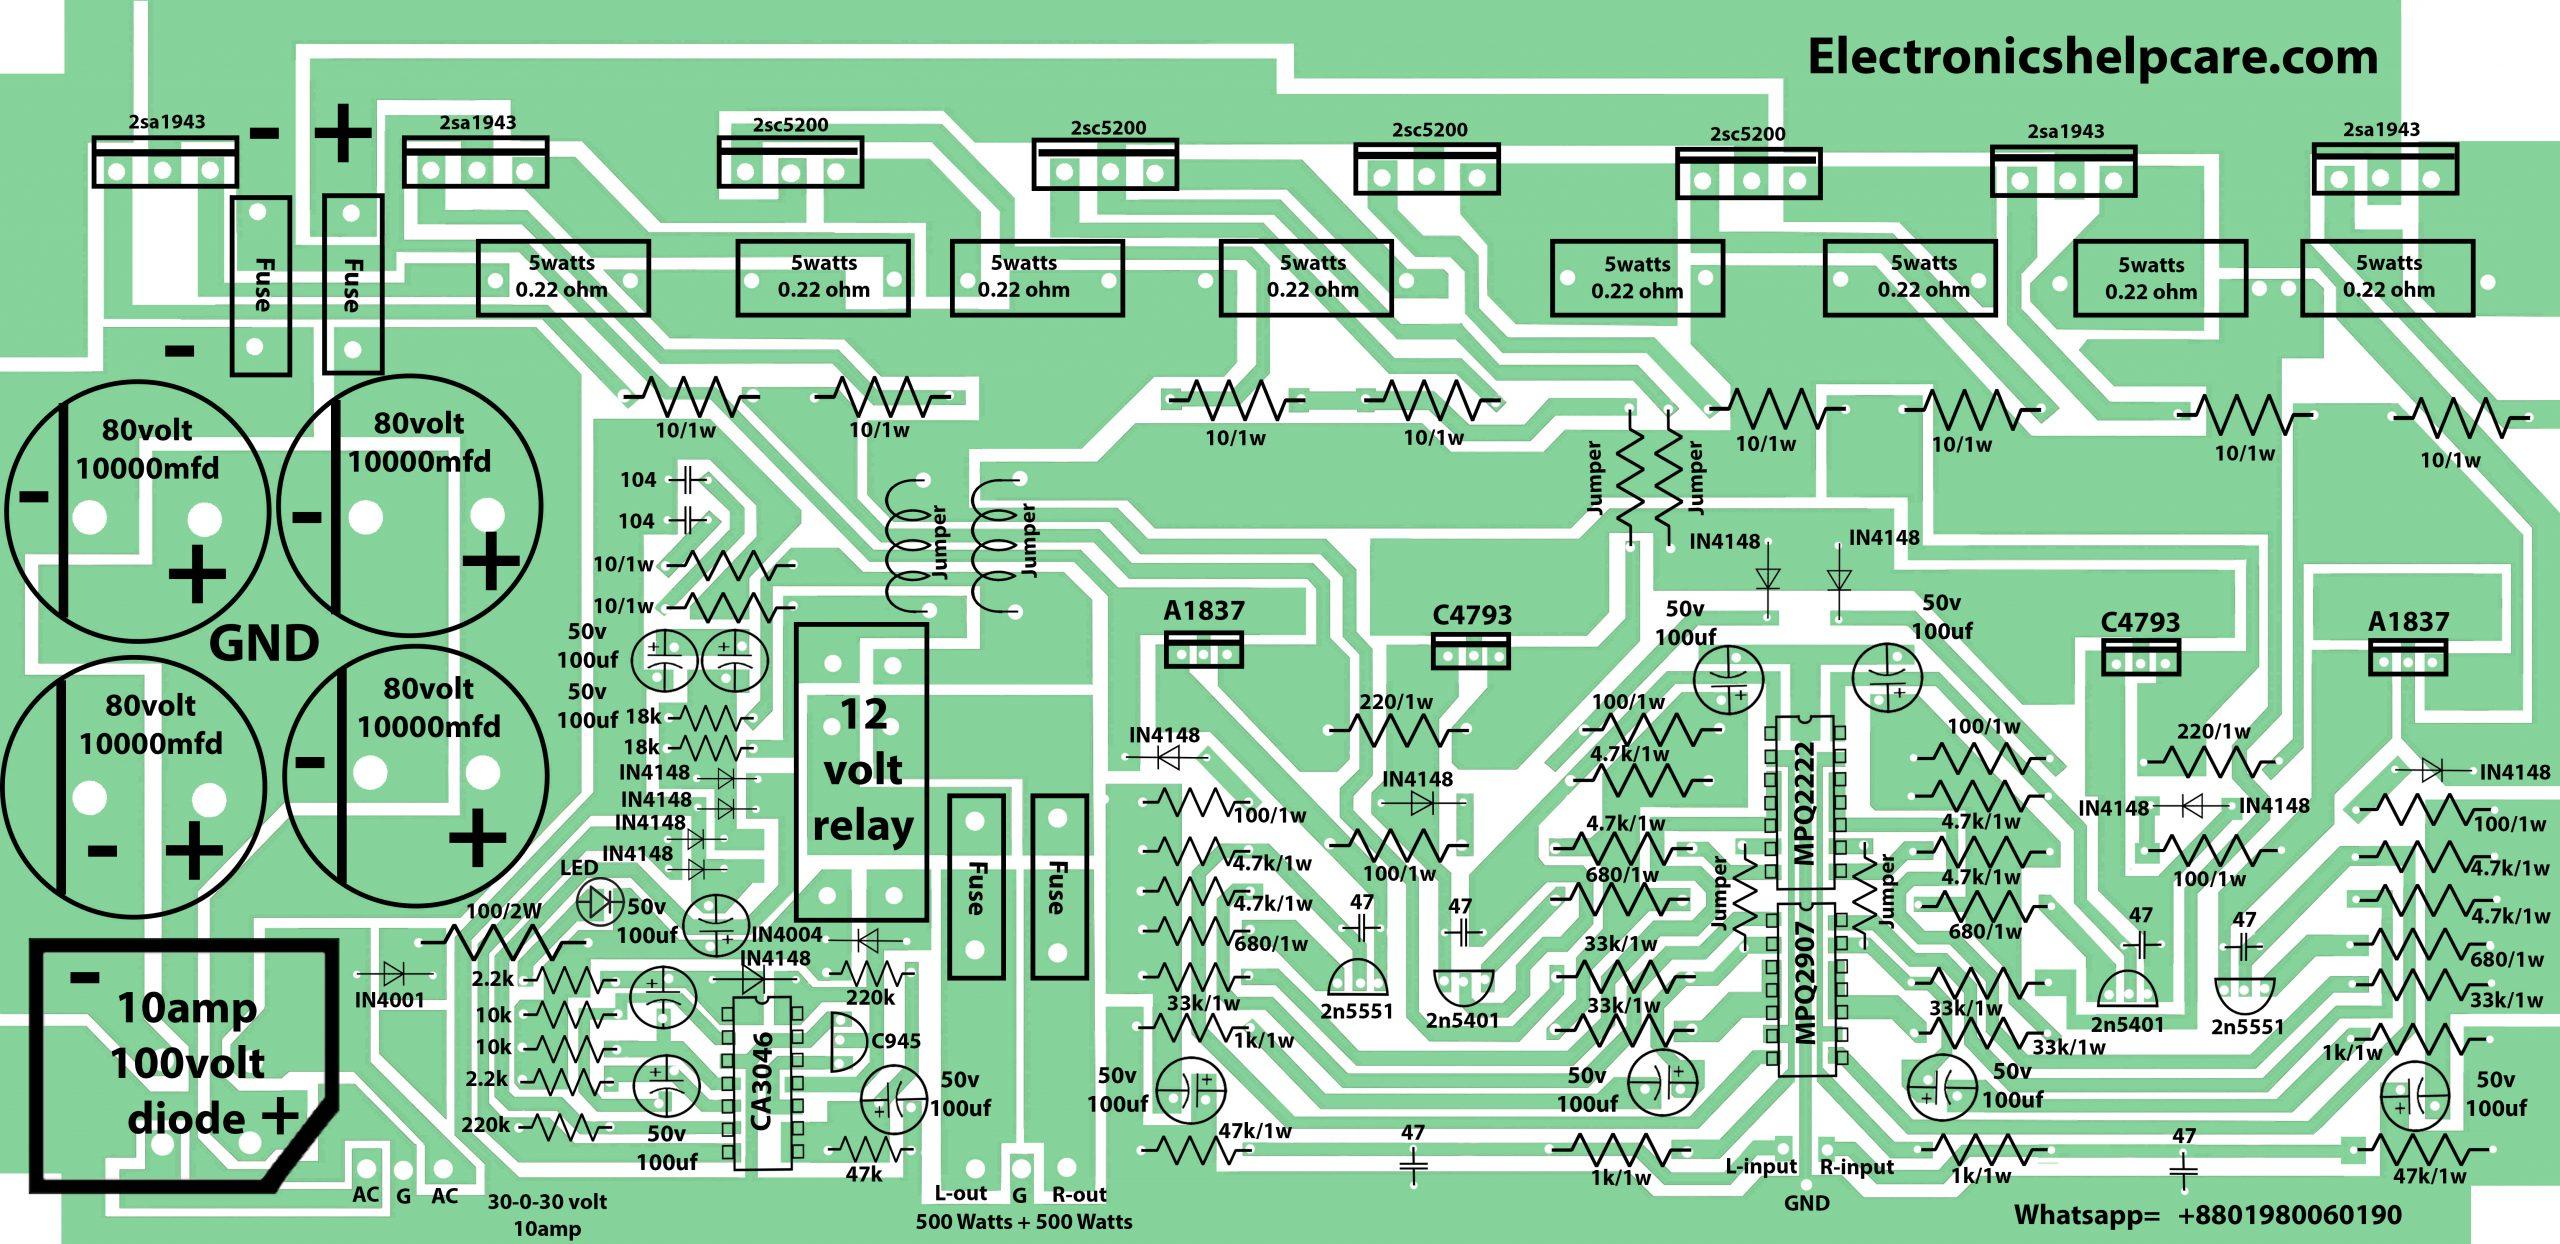 1000 watts amplifier circuit diagram using 2sc5200 and 2sa1943